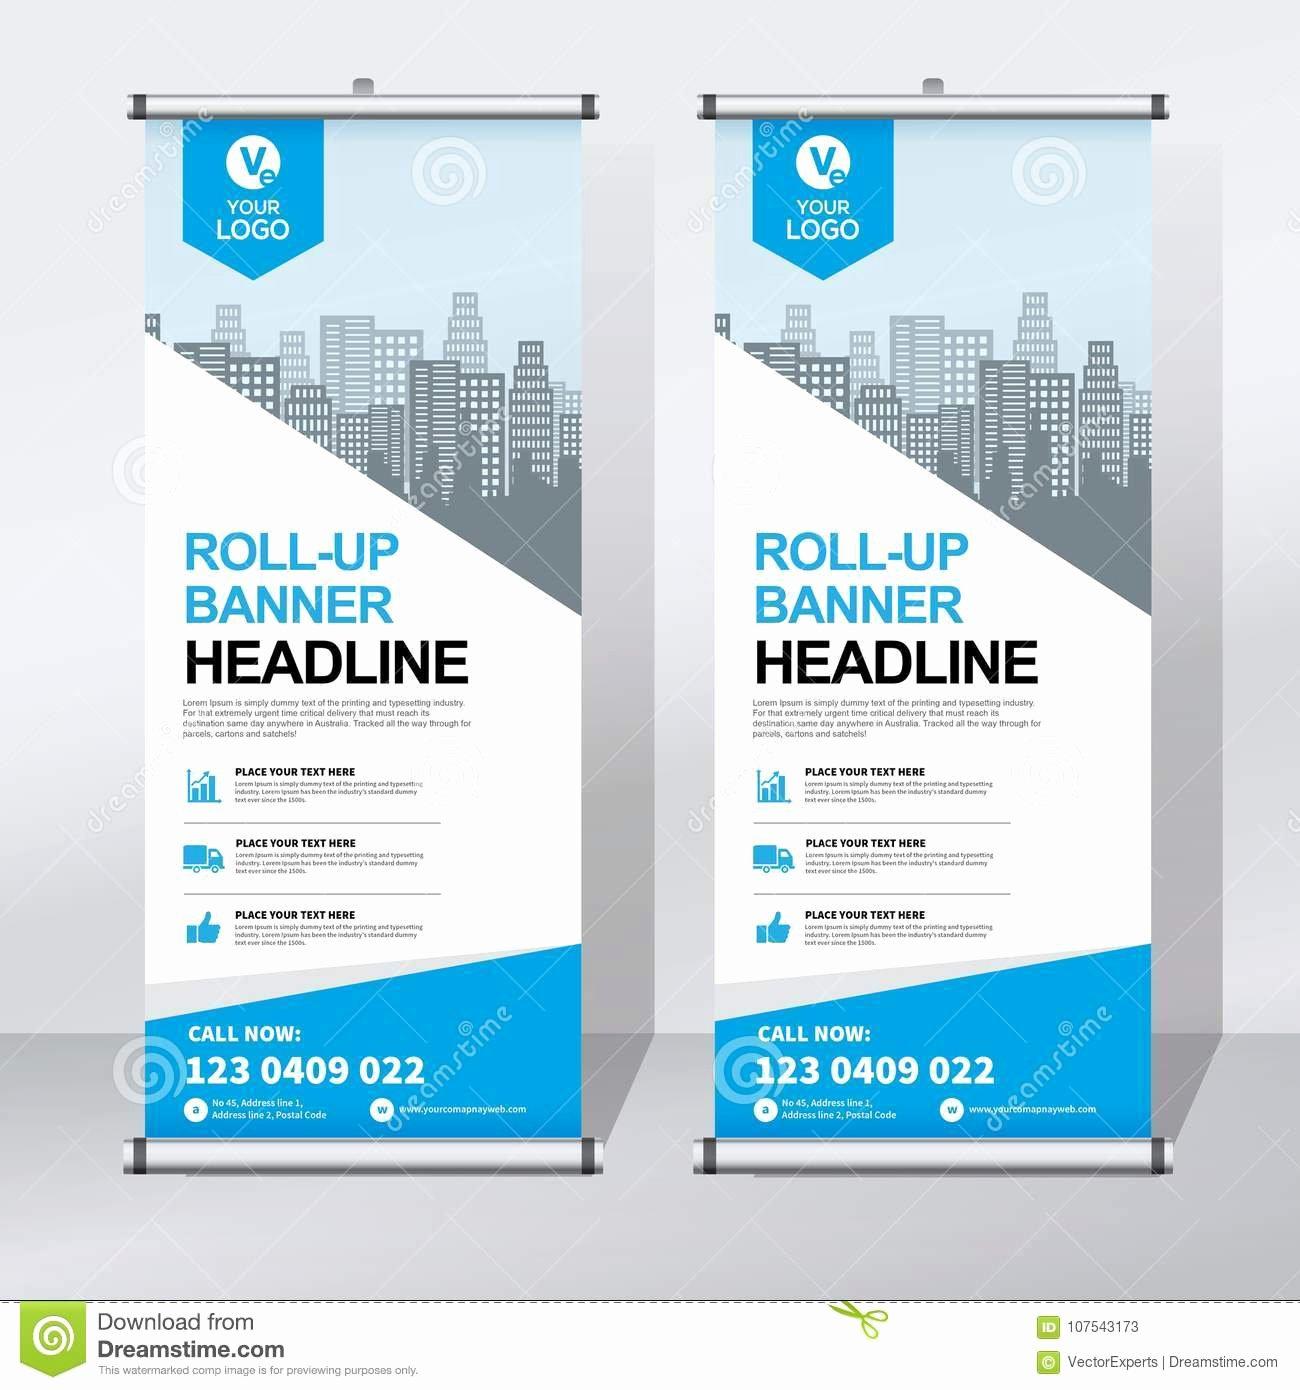 Retractable Banner Design Templates Inspirational Roll Up Banner Design Template Vertical Abstract Background Pull Up Design Modern X Banner